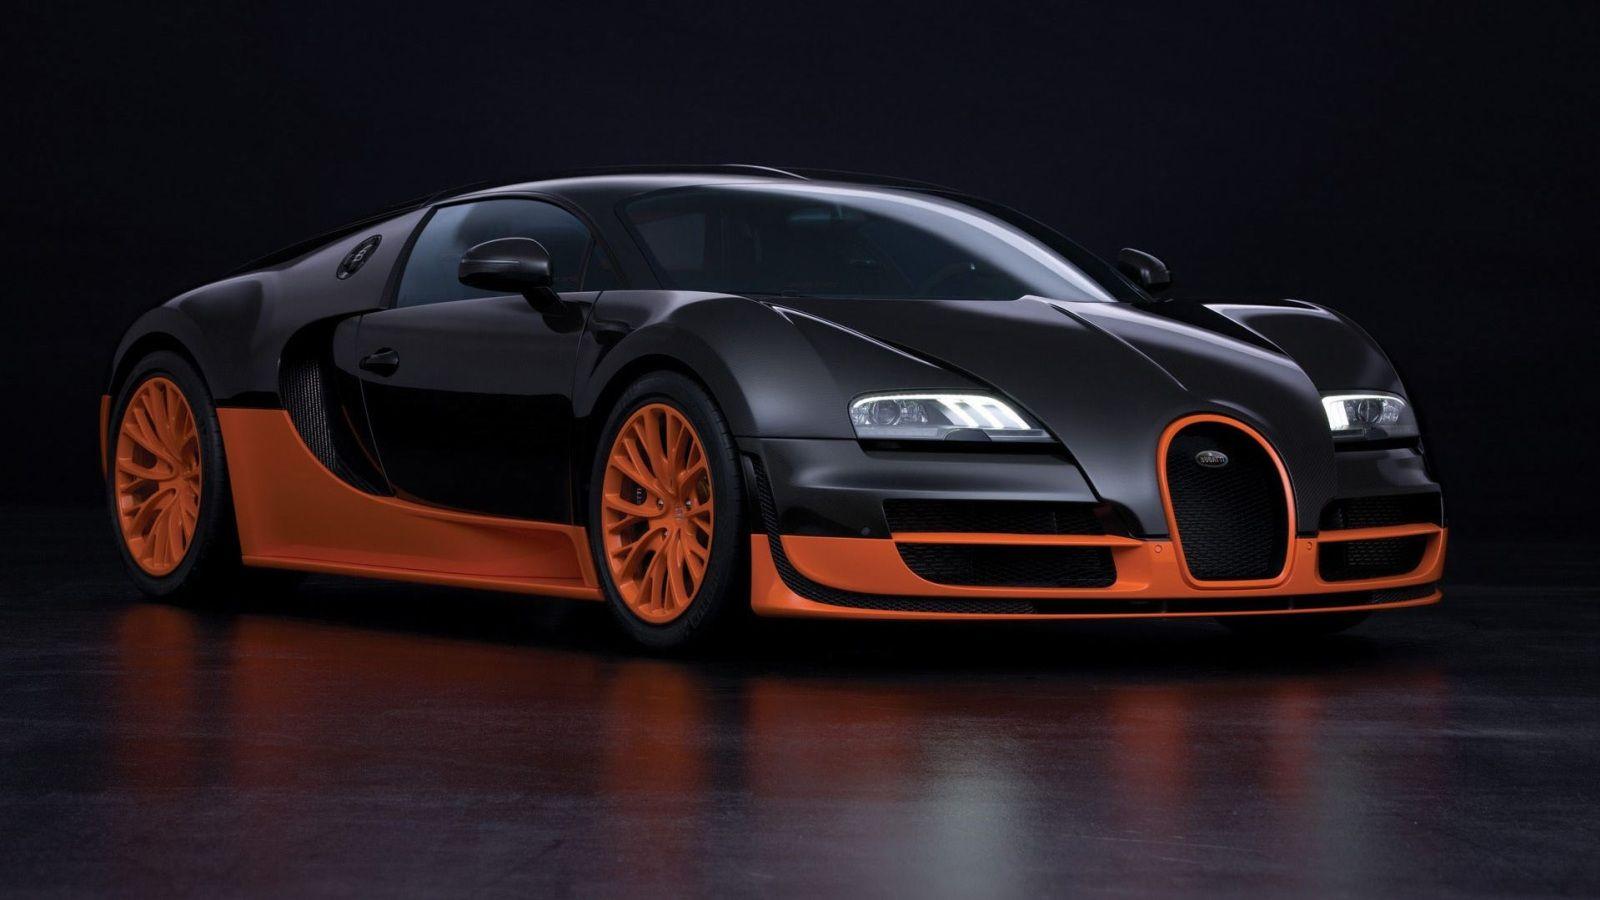 Popular Cars Wallpapers Http Bestwallpapernew Blogspot Com Bugatti Veyron Super Sport Bugatti Veyron Bugatti Cars